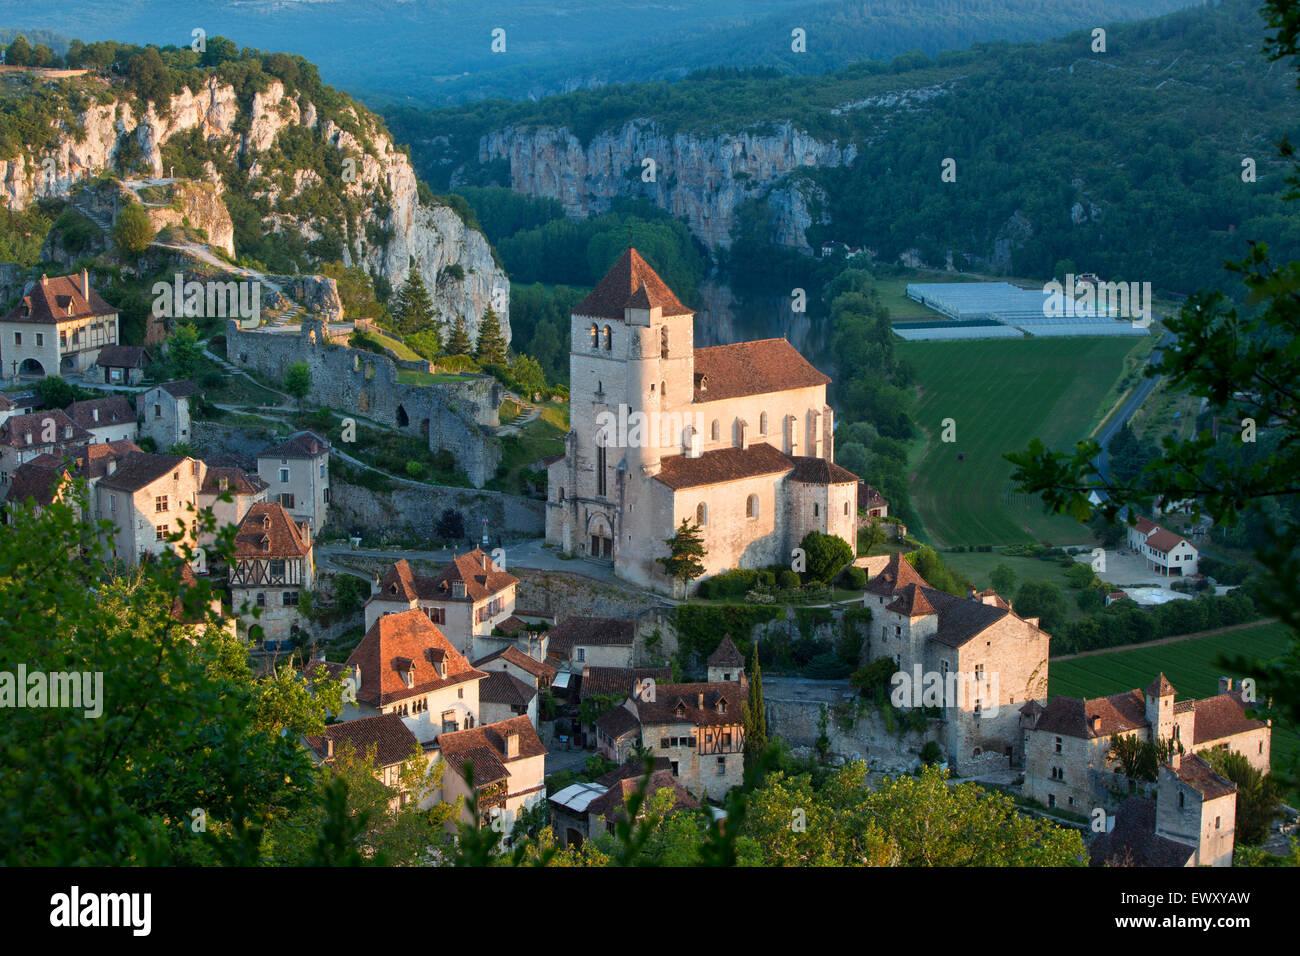 Am frühen Morgen über Saint-Cirq-Lapopie, Tal des Lot, midi-Pyrenäen, Frankreich Stockbild